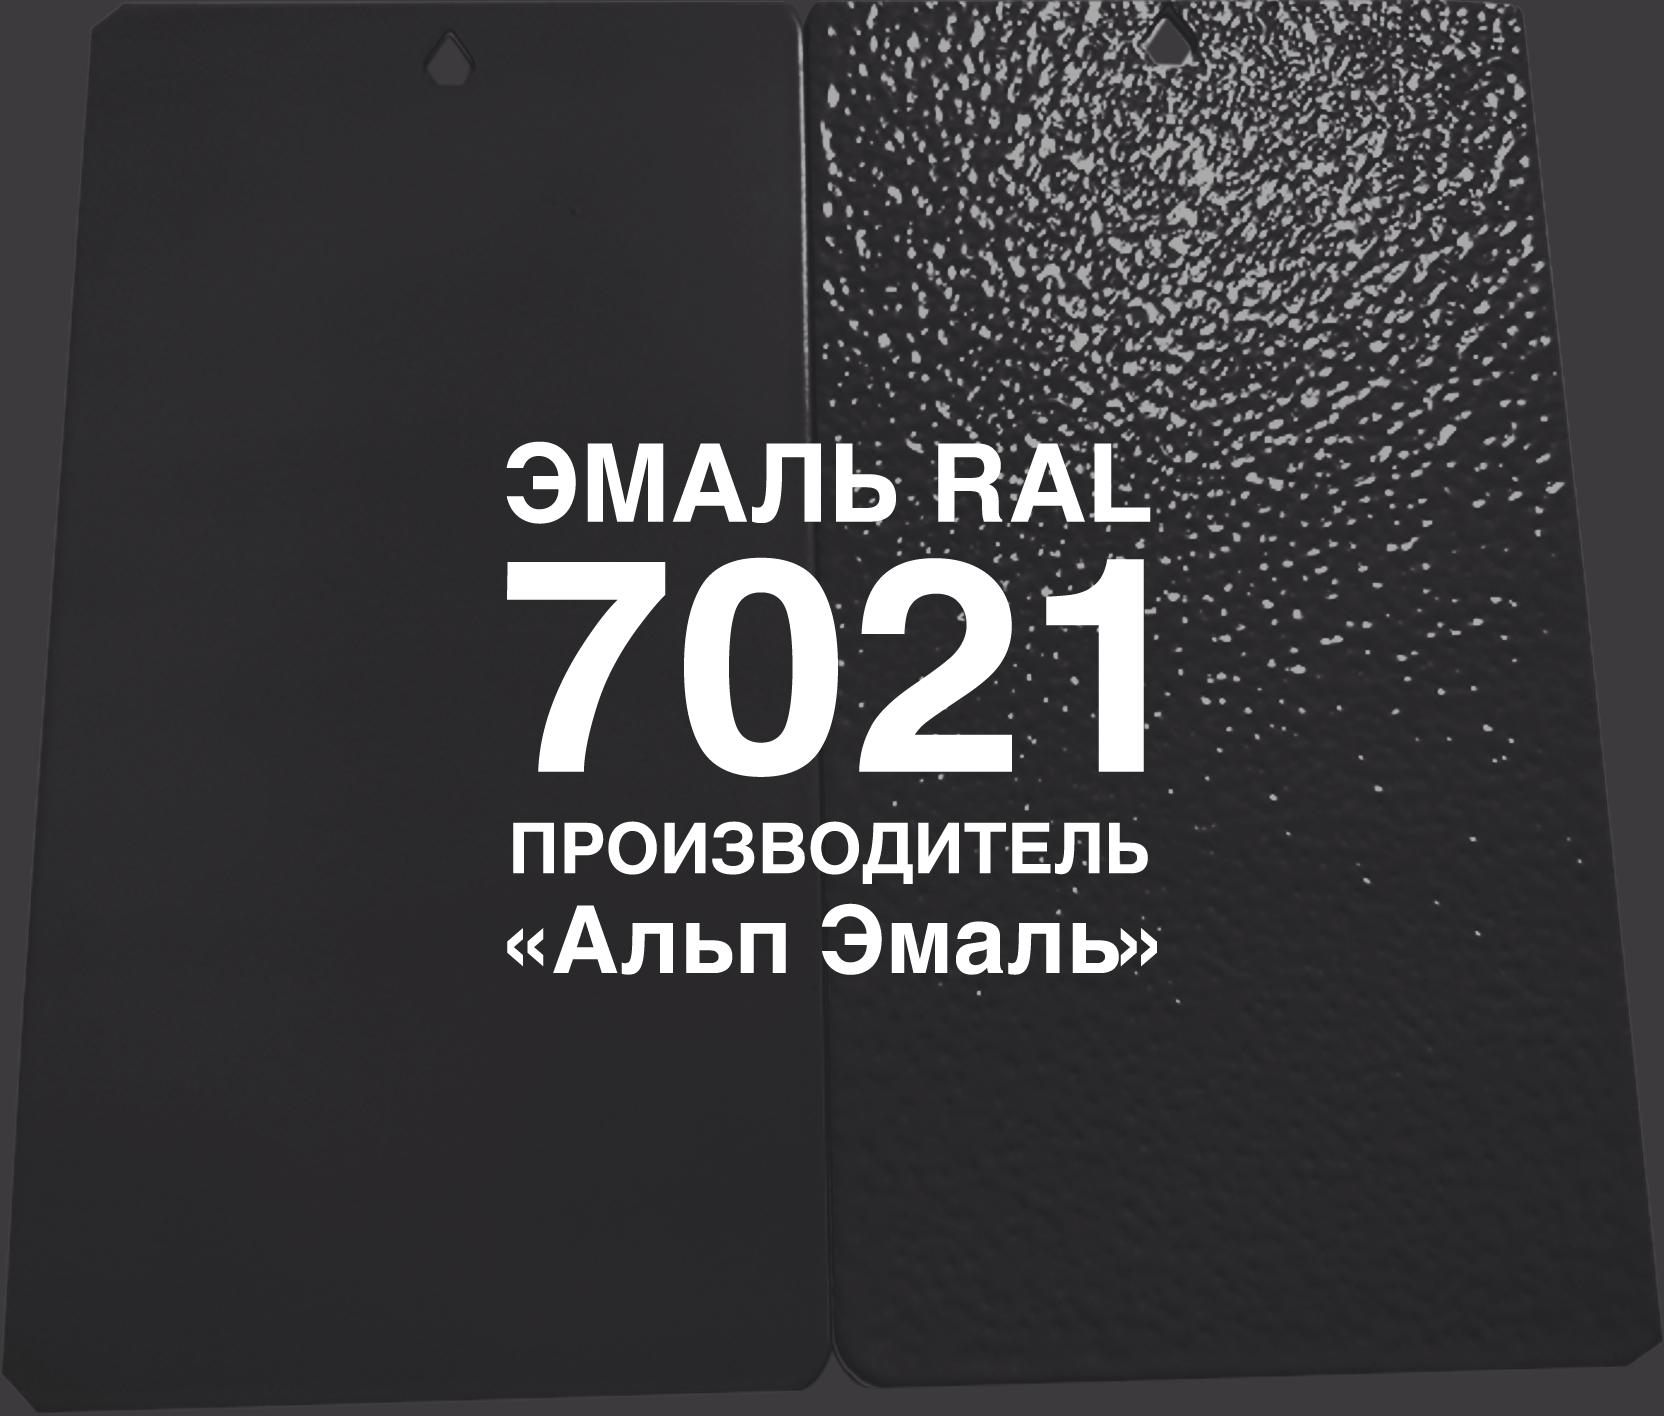 Краска эмаль RAL 7021 серая ЗАО Альп Эмаль